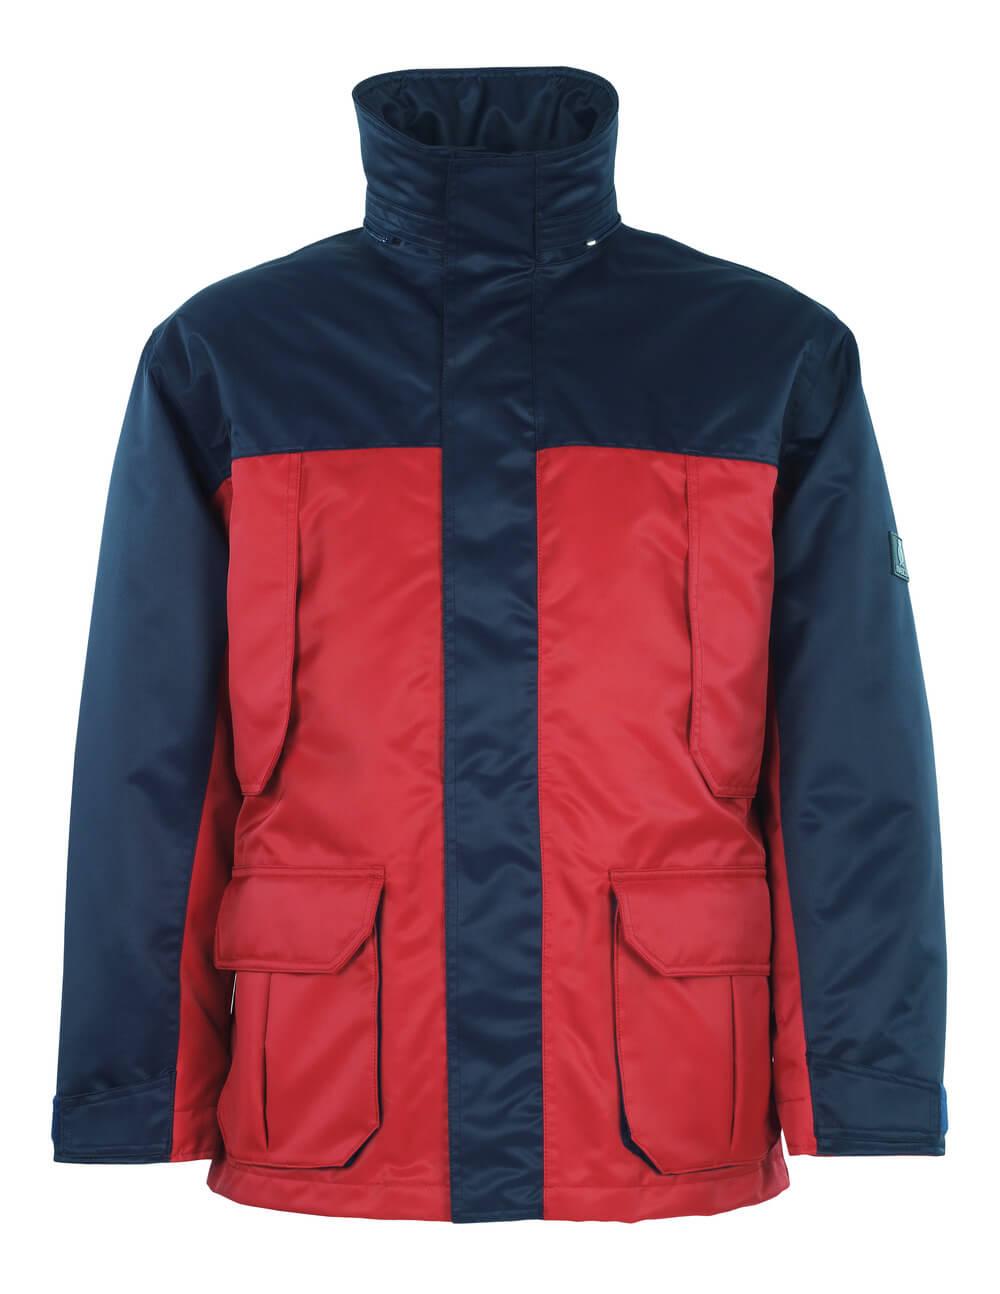 00930-650-21 Parka Jacket - red/navy